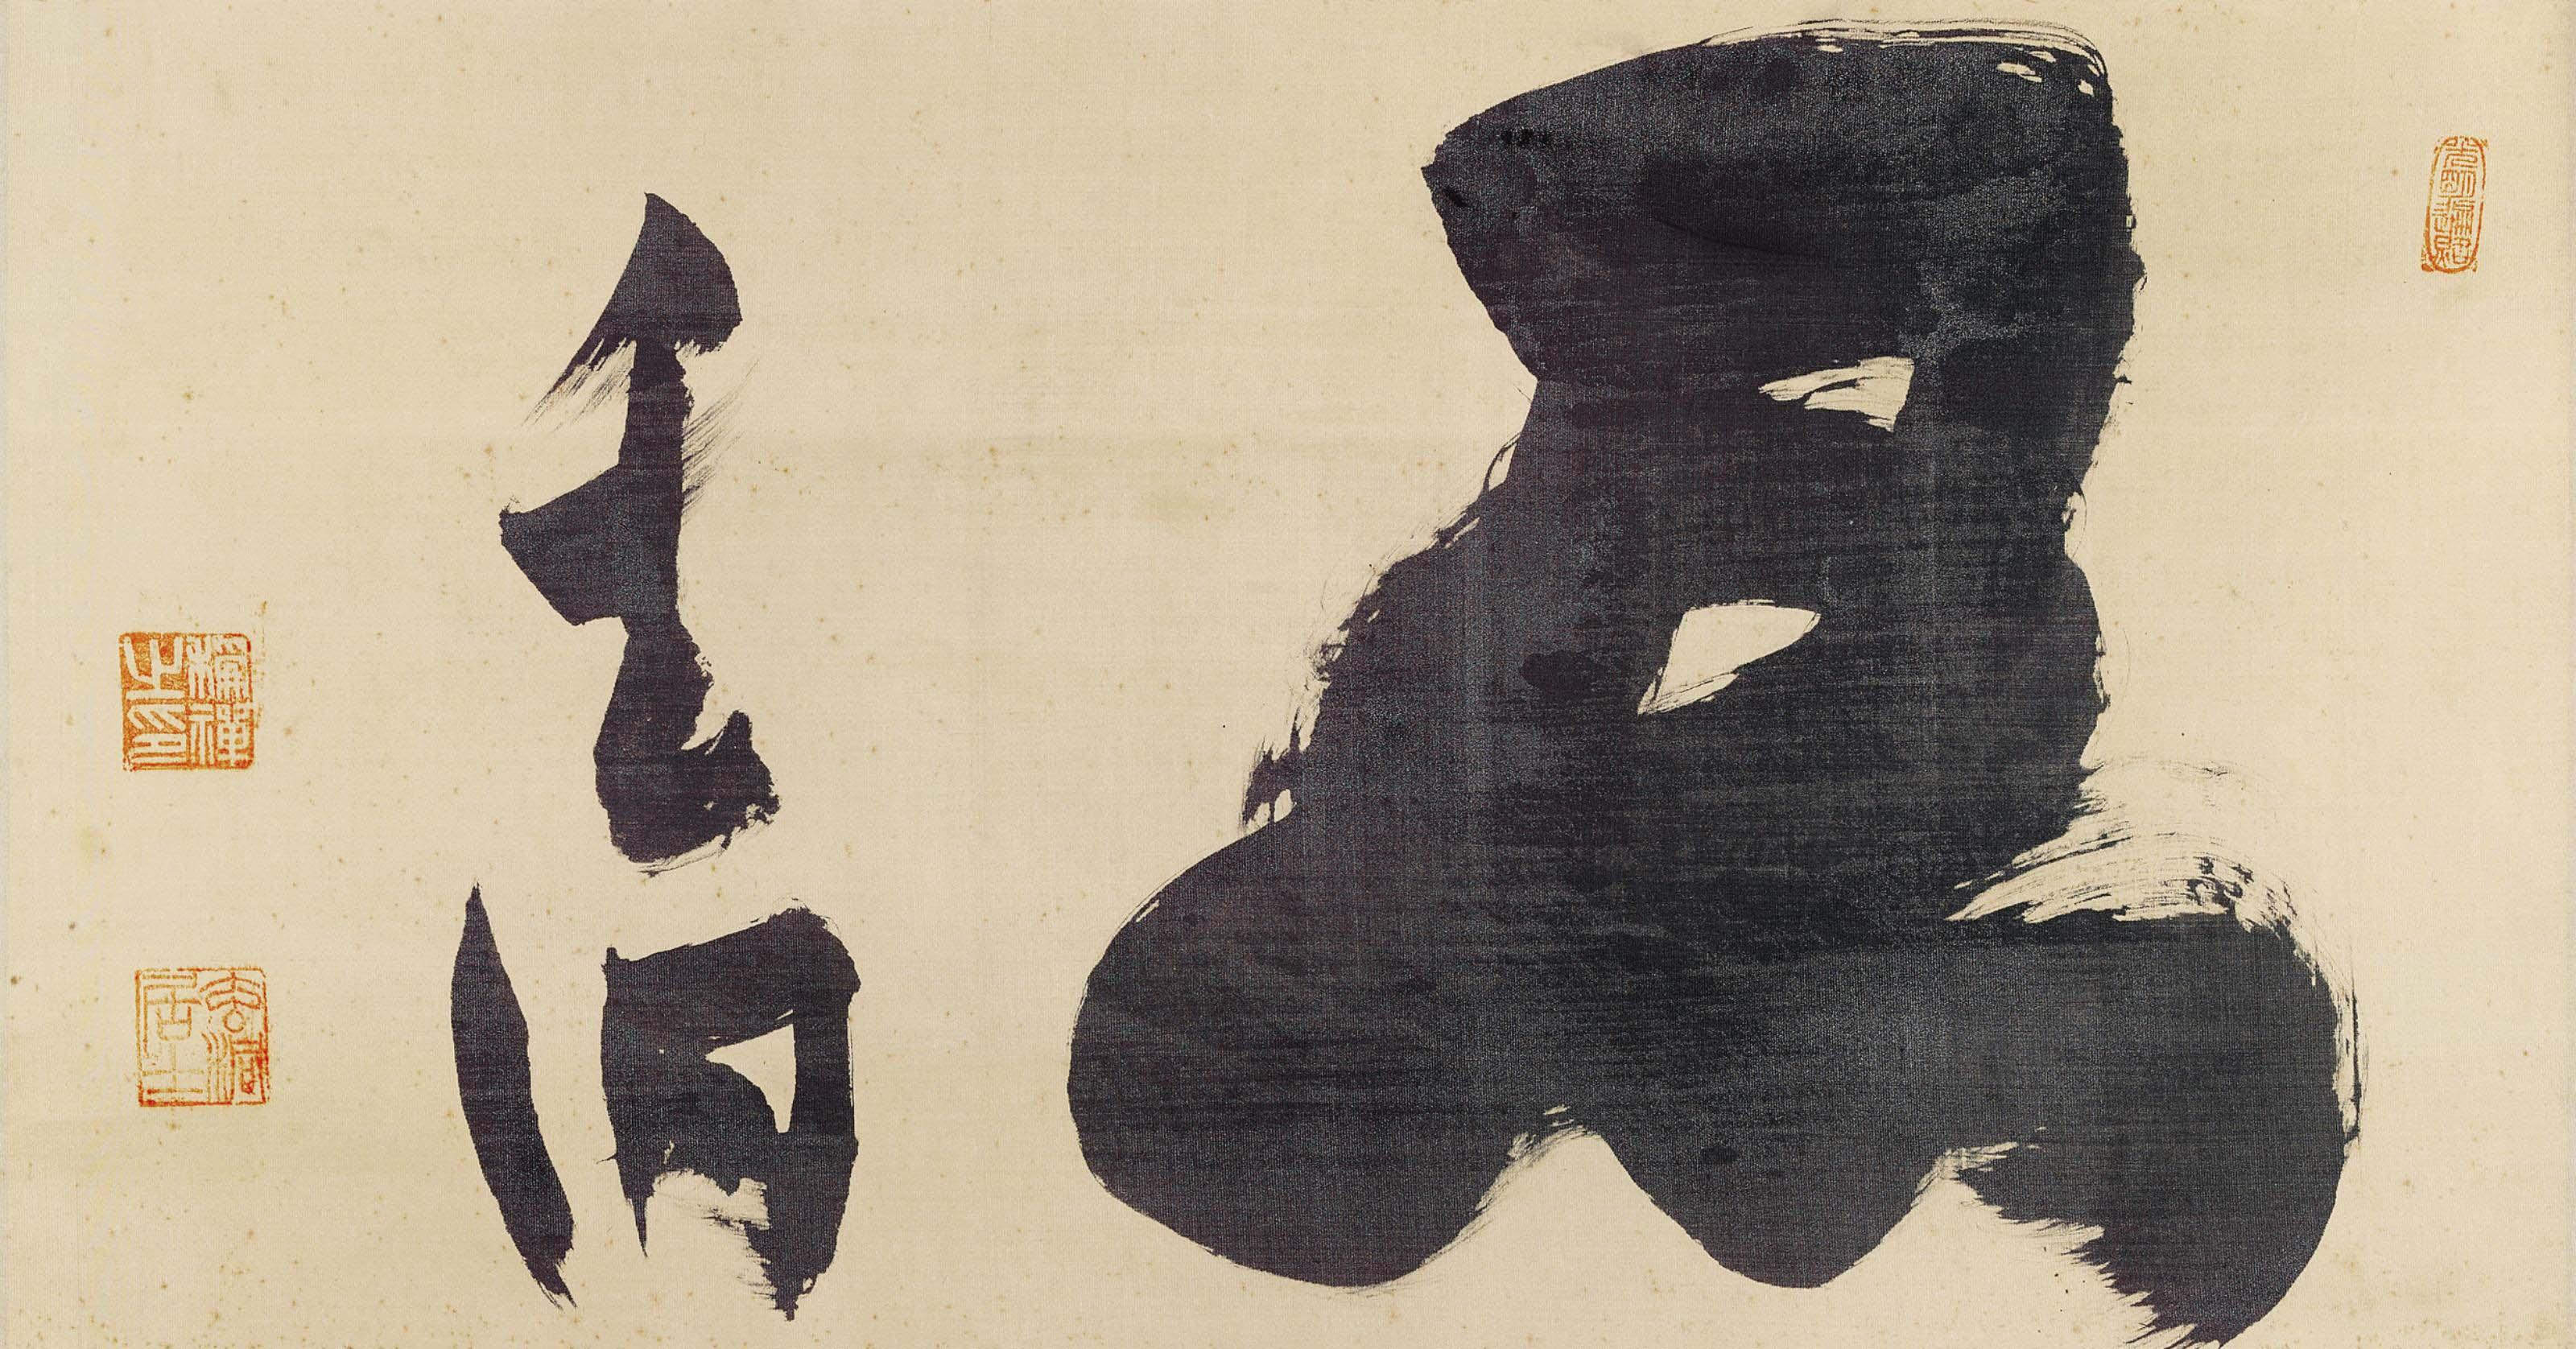 Yamaguchi Gendo (1862-1937)